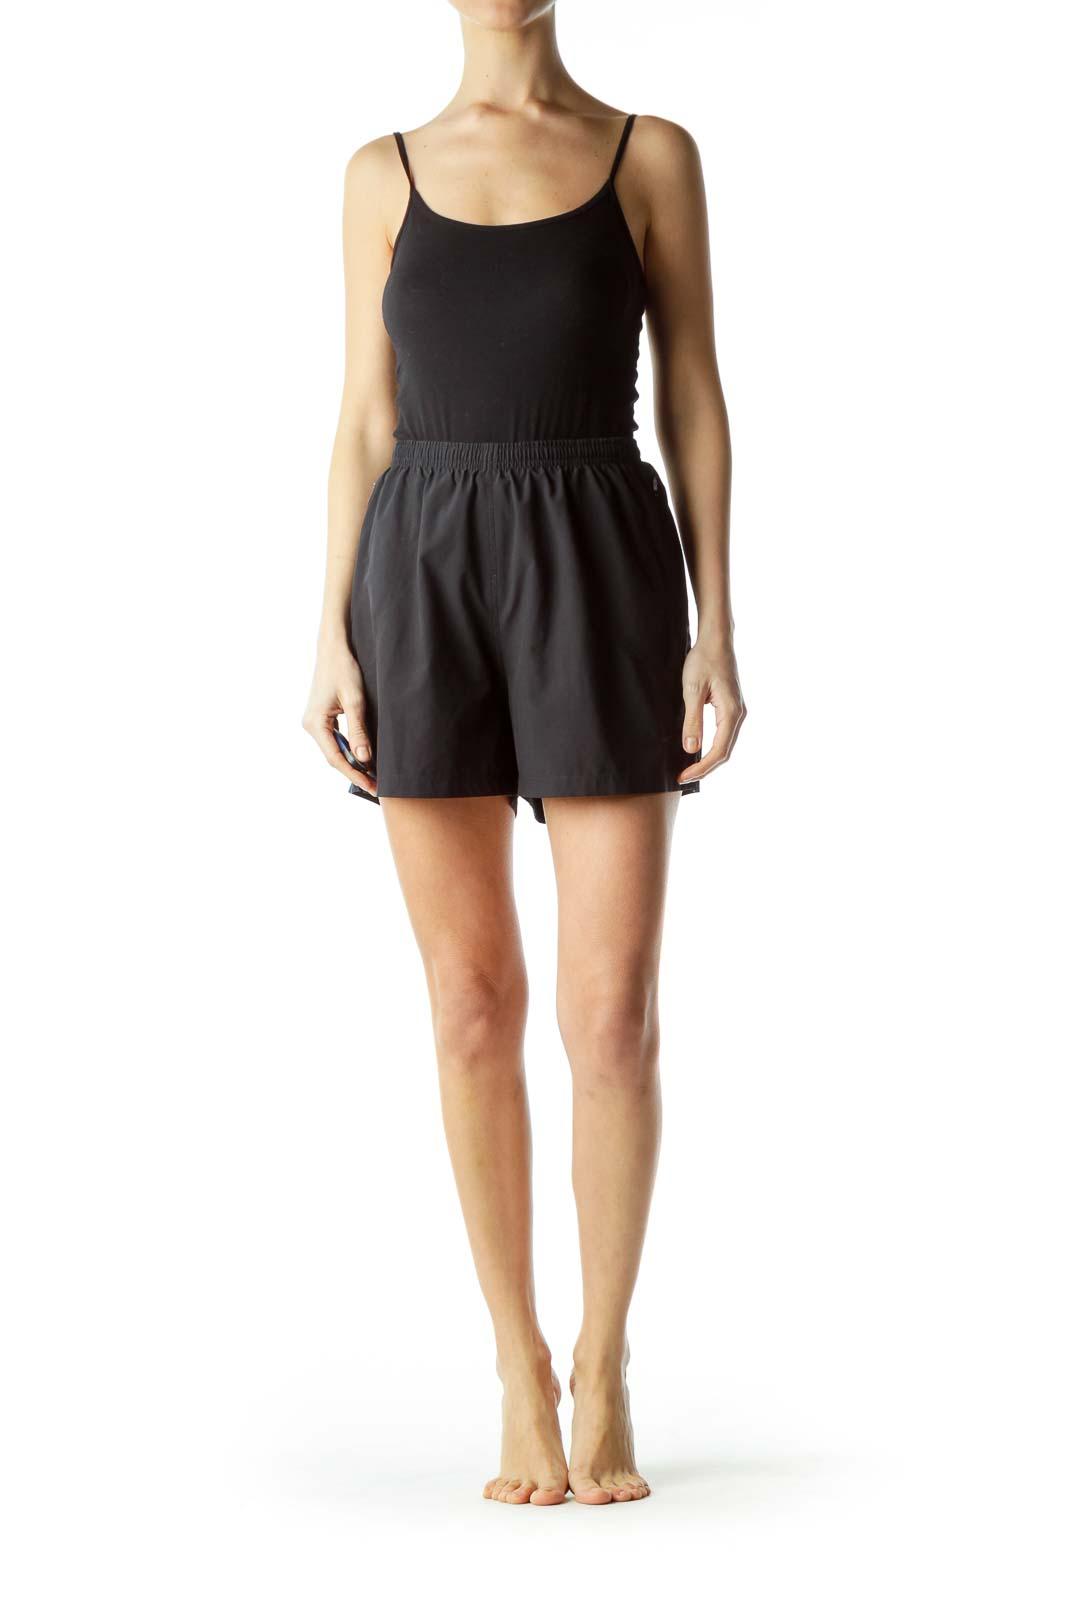 Black Sports Shorts